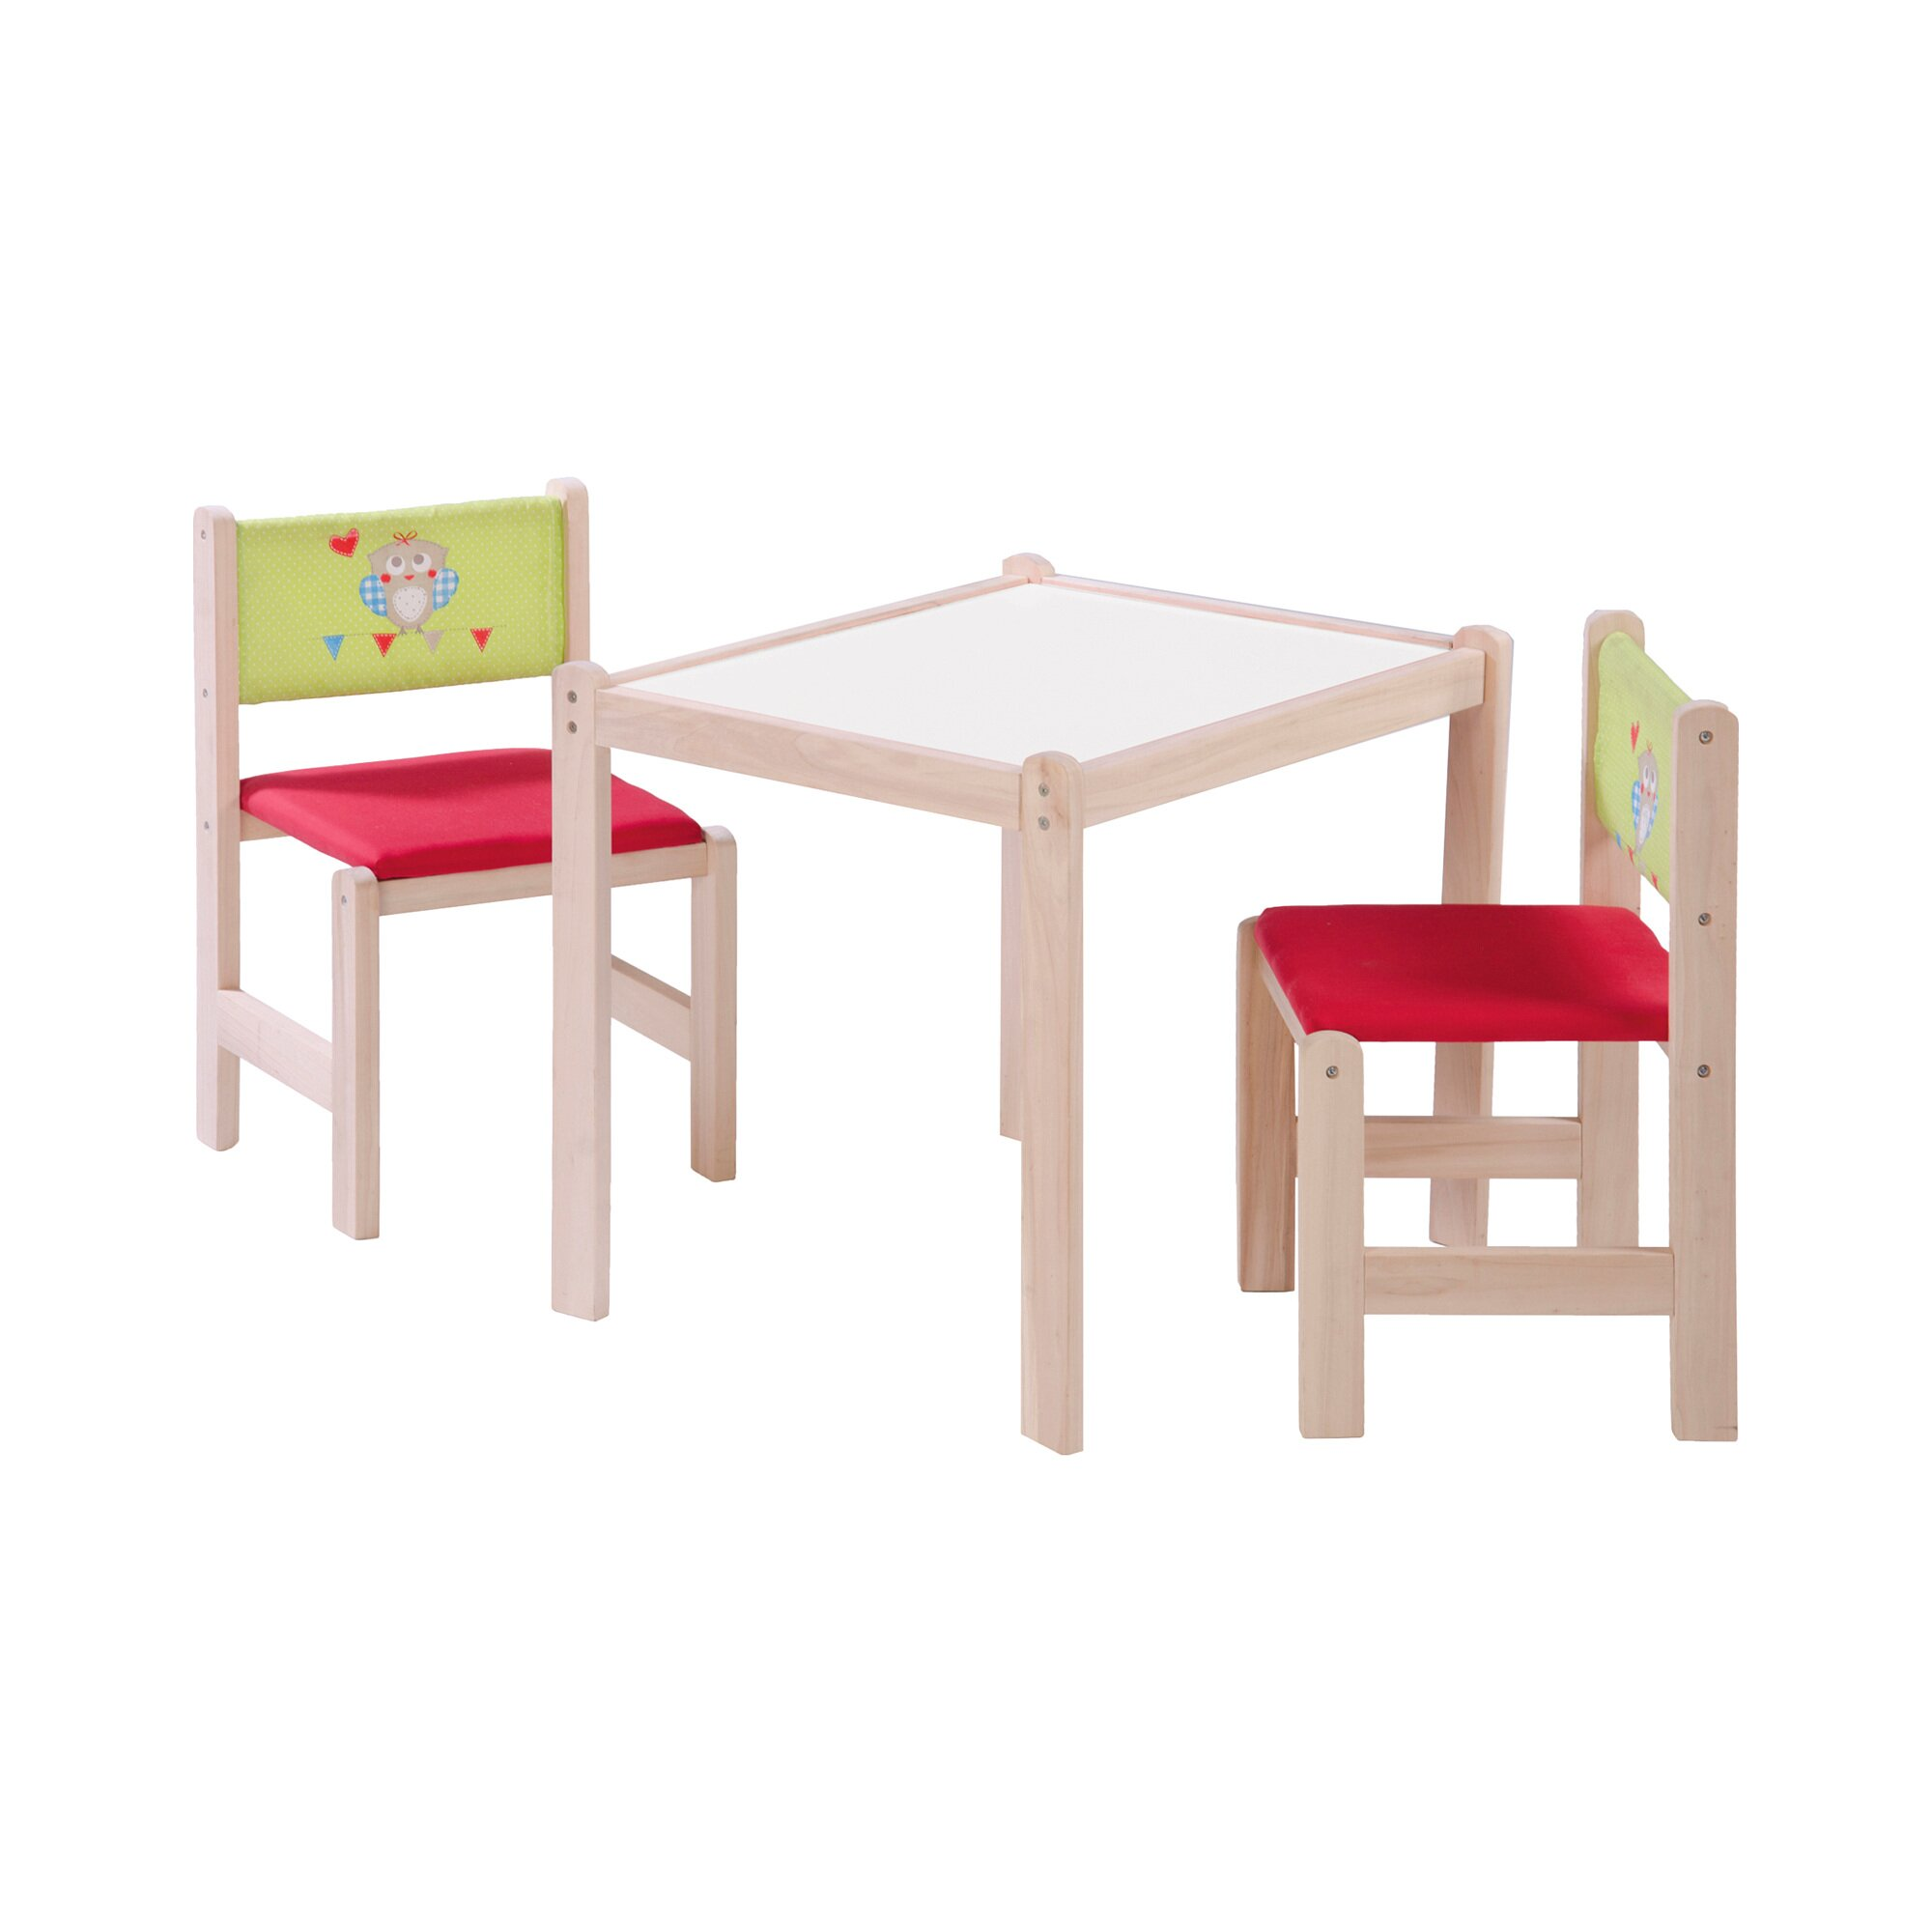 roba-kindersitzgruppe-eule-, 58.99 EUR @ babywalz-de